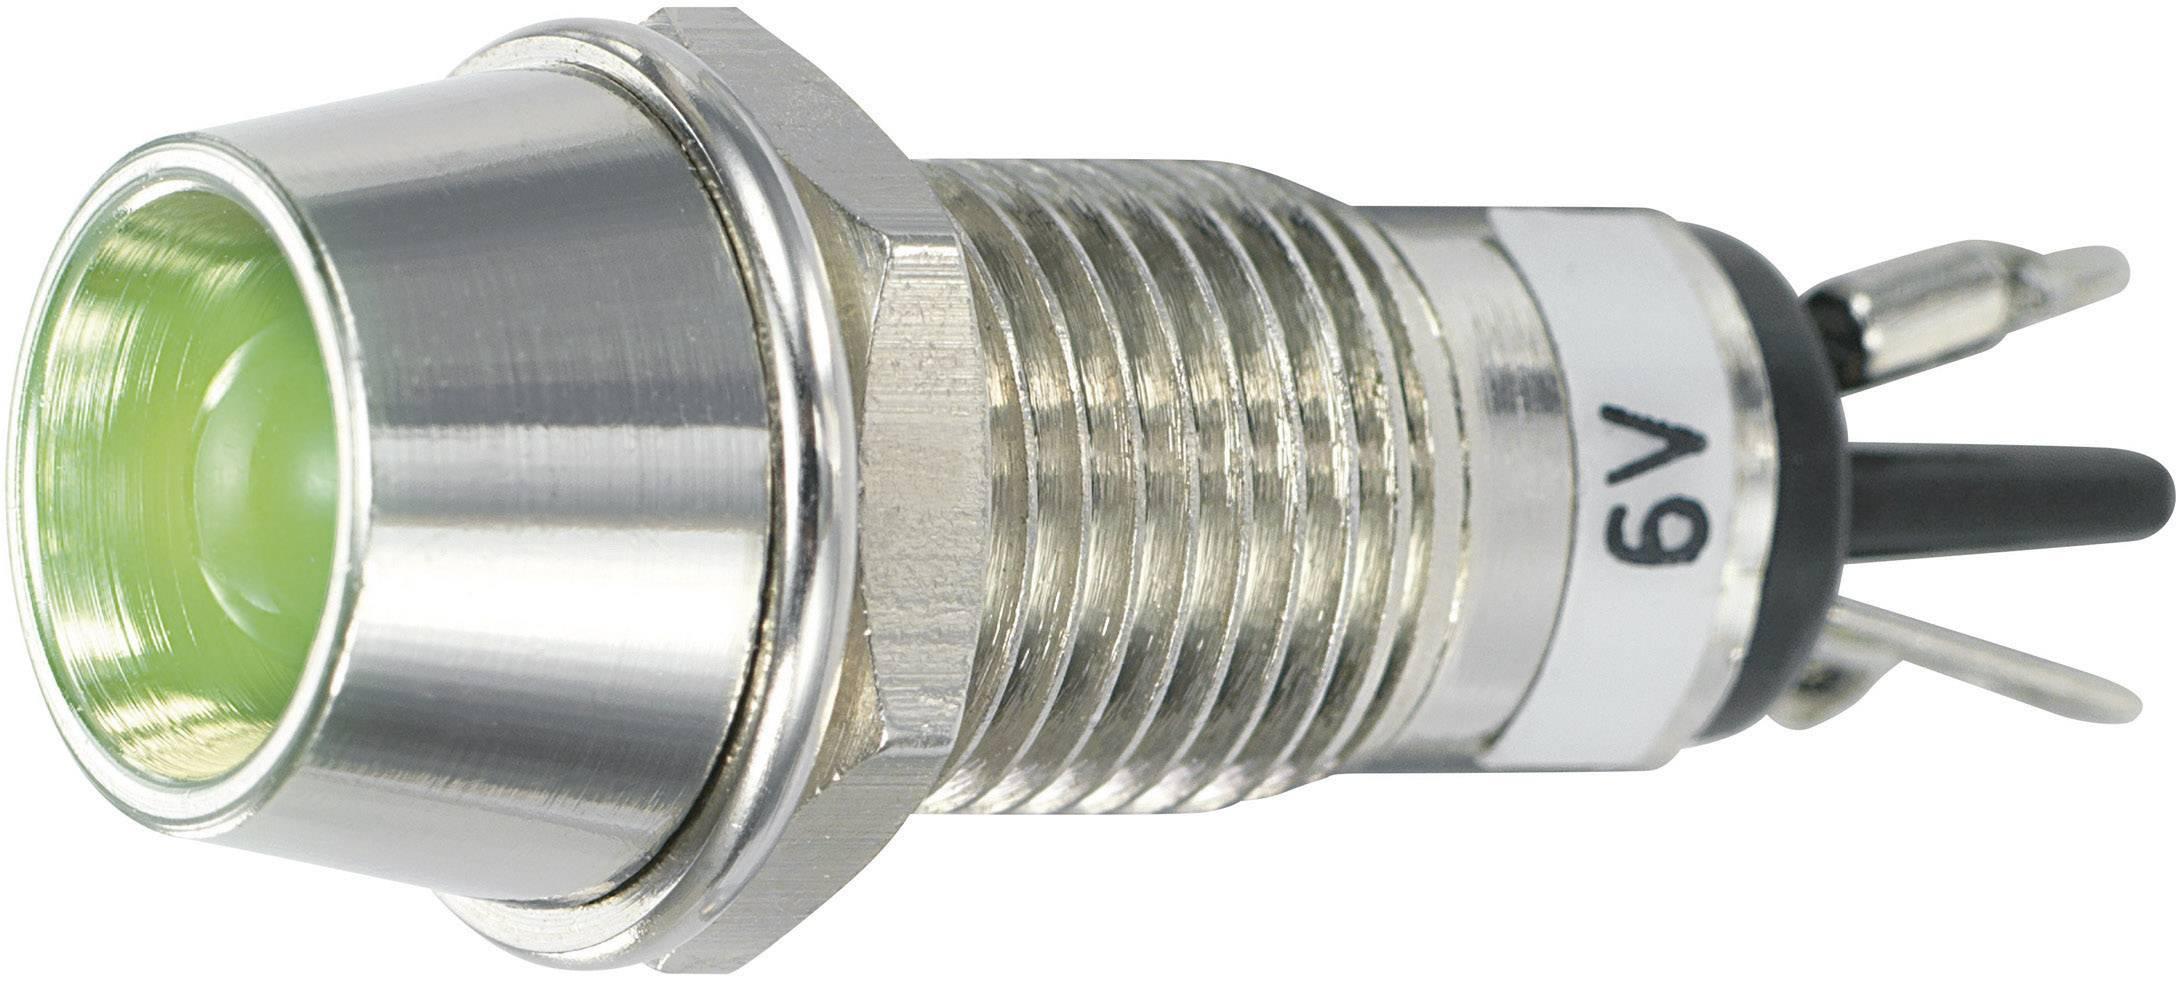 IndikačnéLED SCI R9-115L 6 V GREEN, 6 V/DC, zelená